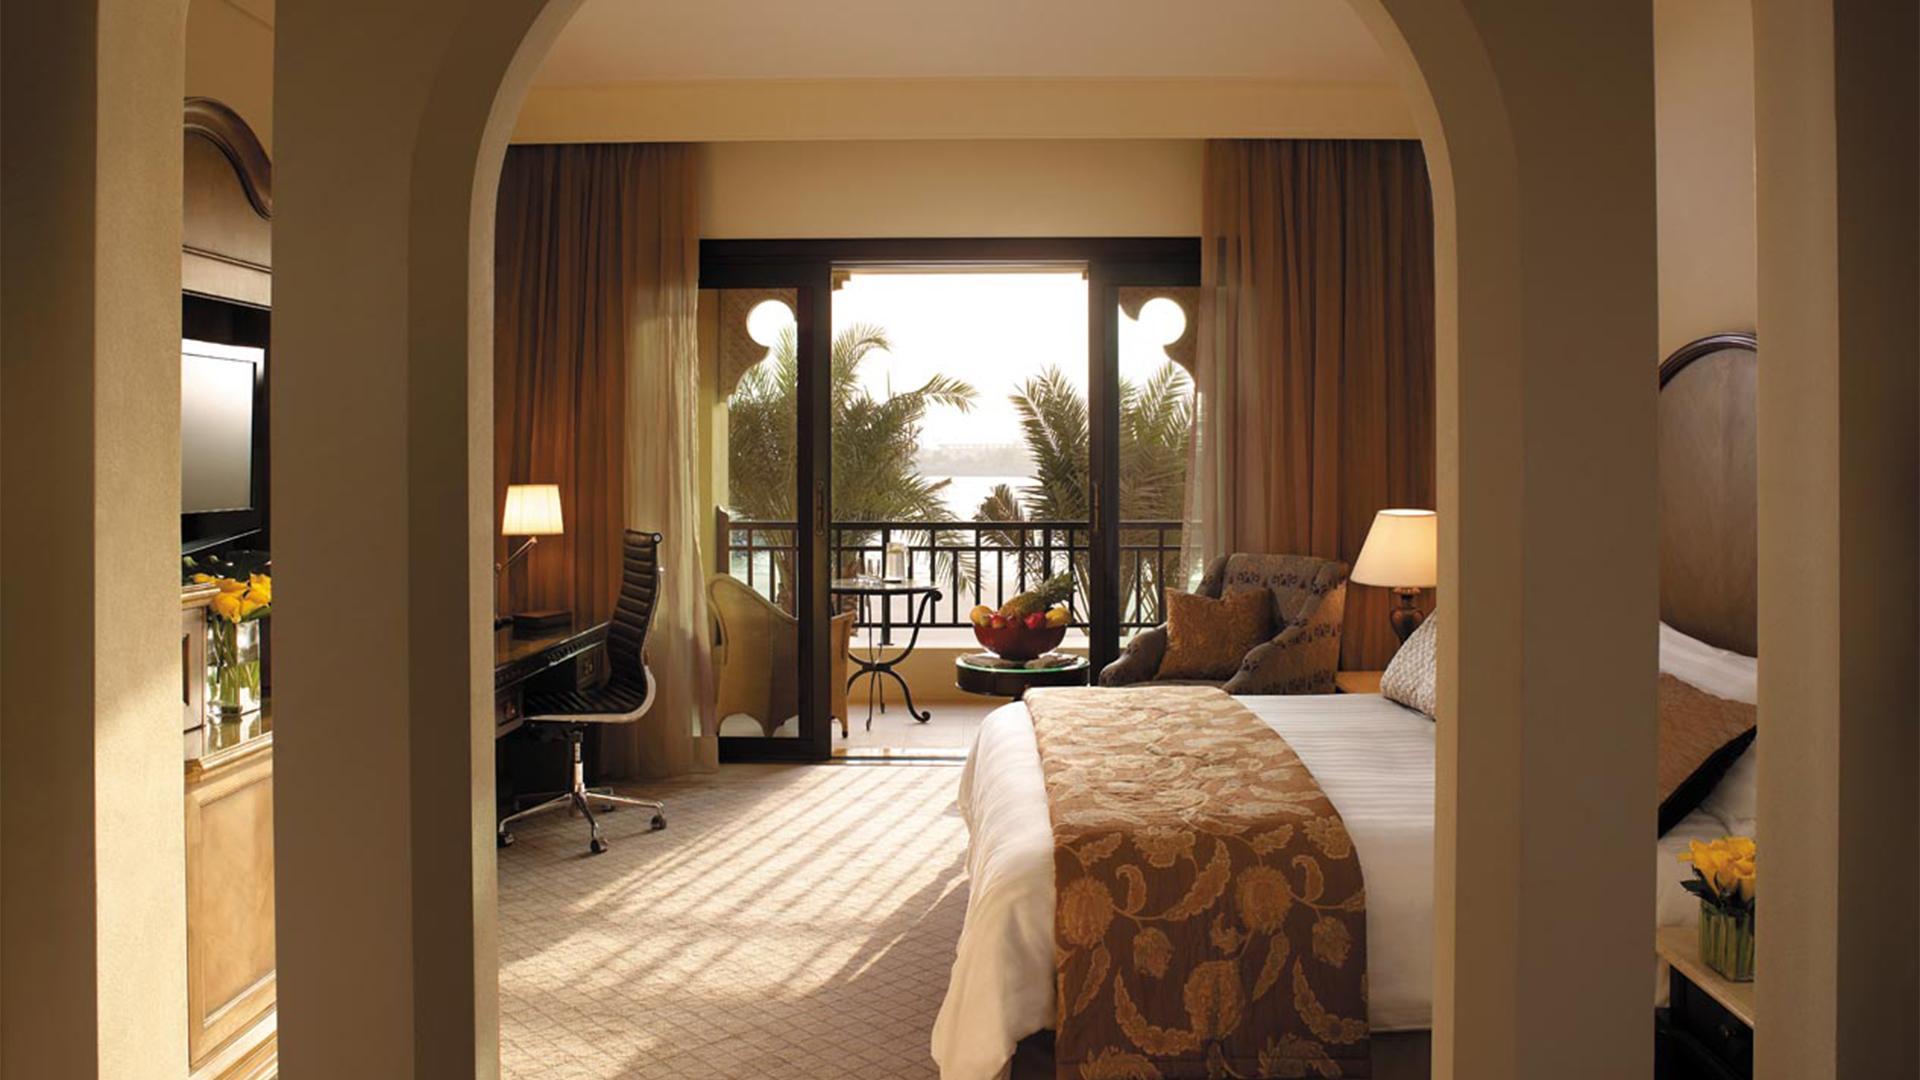 Deluxe Room image 1 at Shangri-La Hotel, Qaryat Al Beri, Abu Dhabi by null, Abu Dhabi, United Arab Emirates